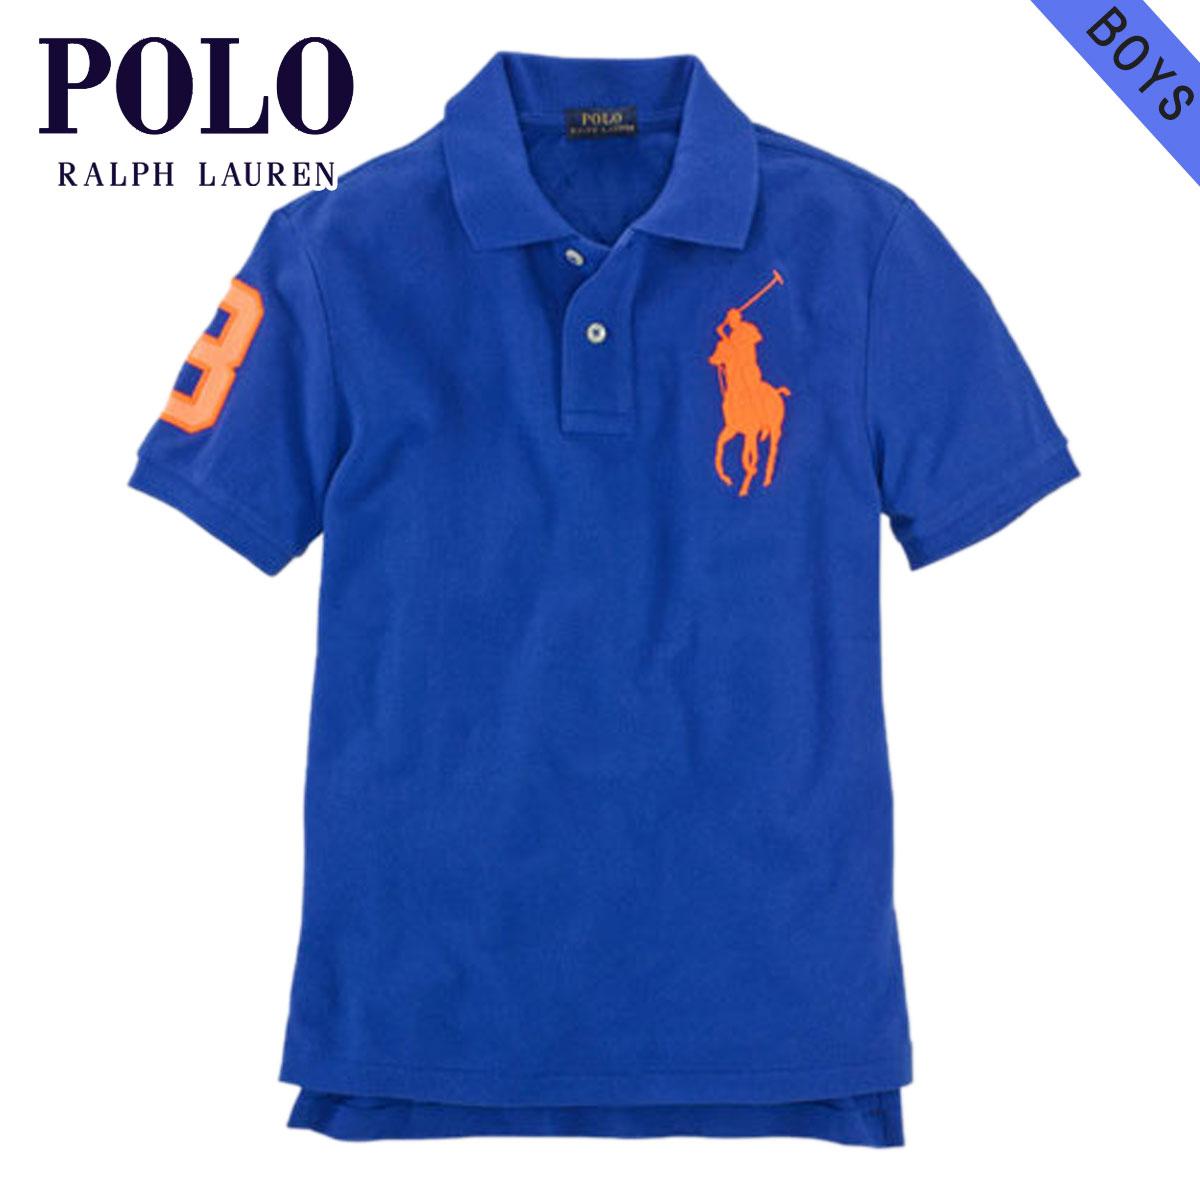 e38dc10a54cd Polo Ralph Lauren kids POLO RALPH LAUREN CHILDREN regular article children s  clothes boys polo shirt Custom-Fit Big Pony Polo Shirt 52138556 D20S30